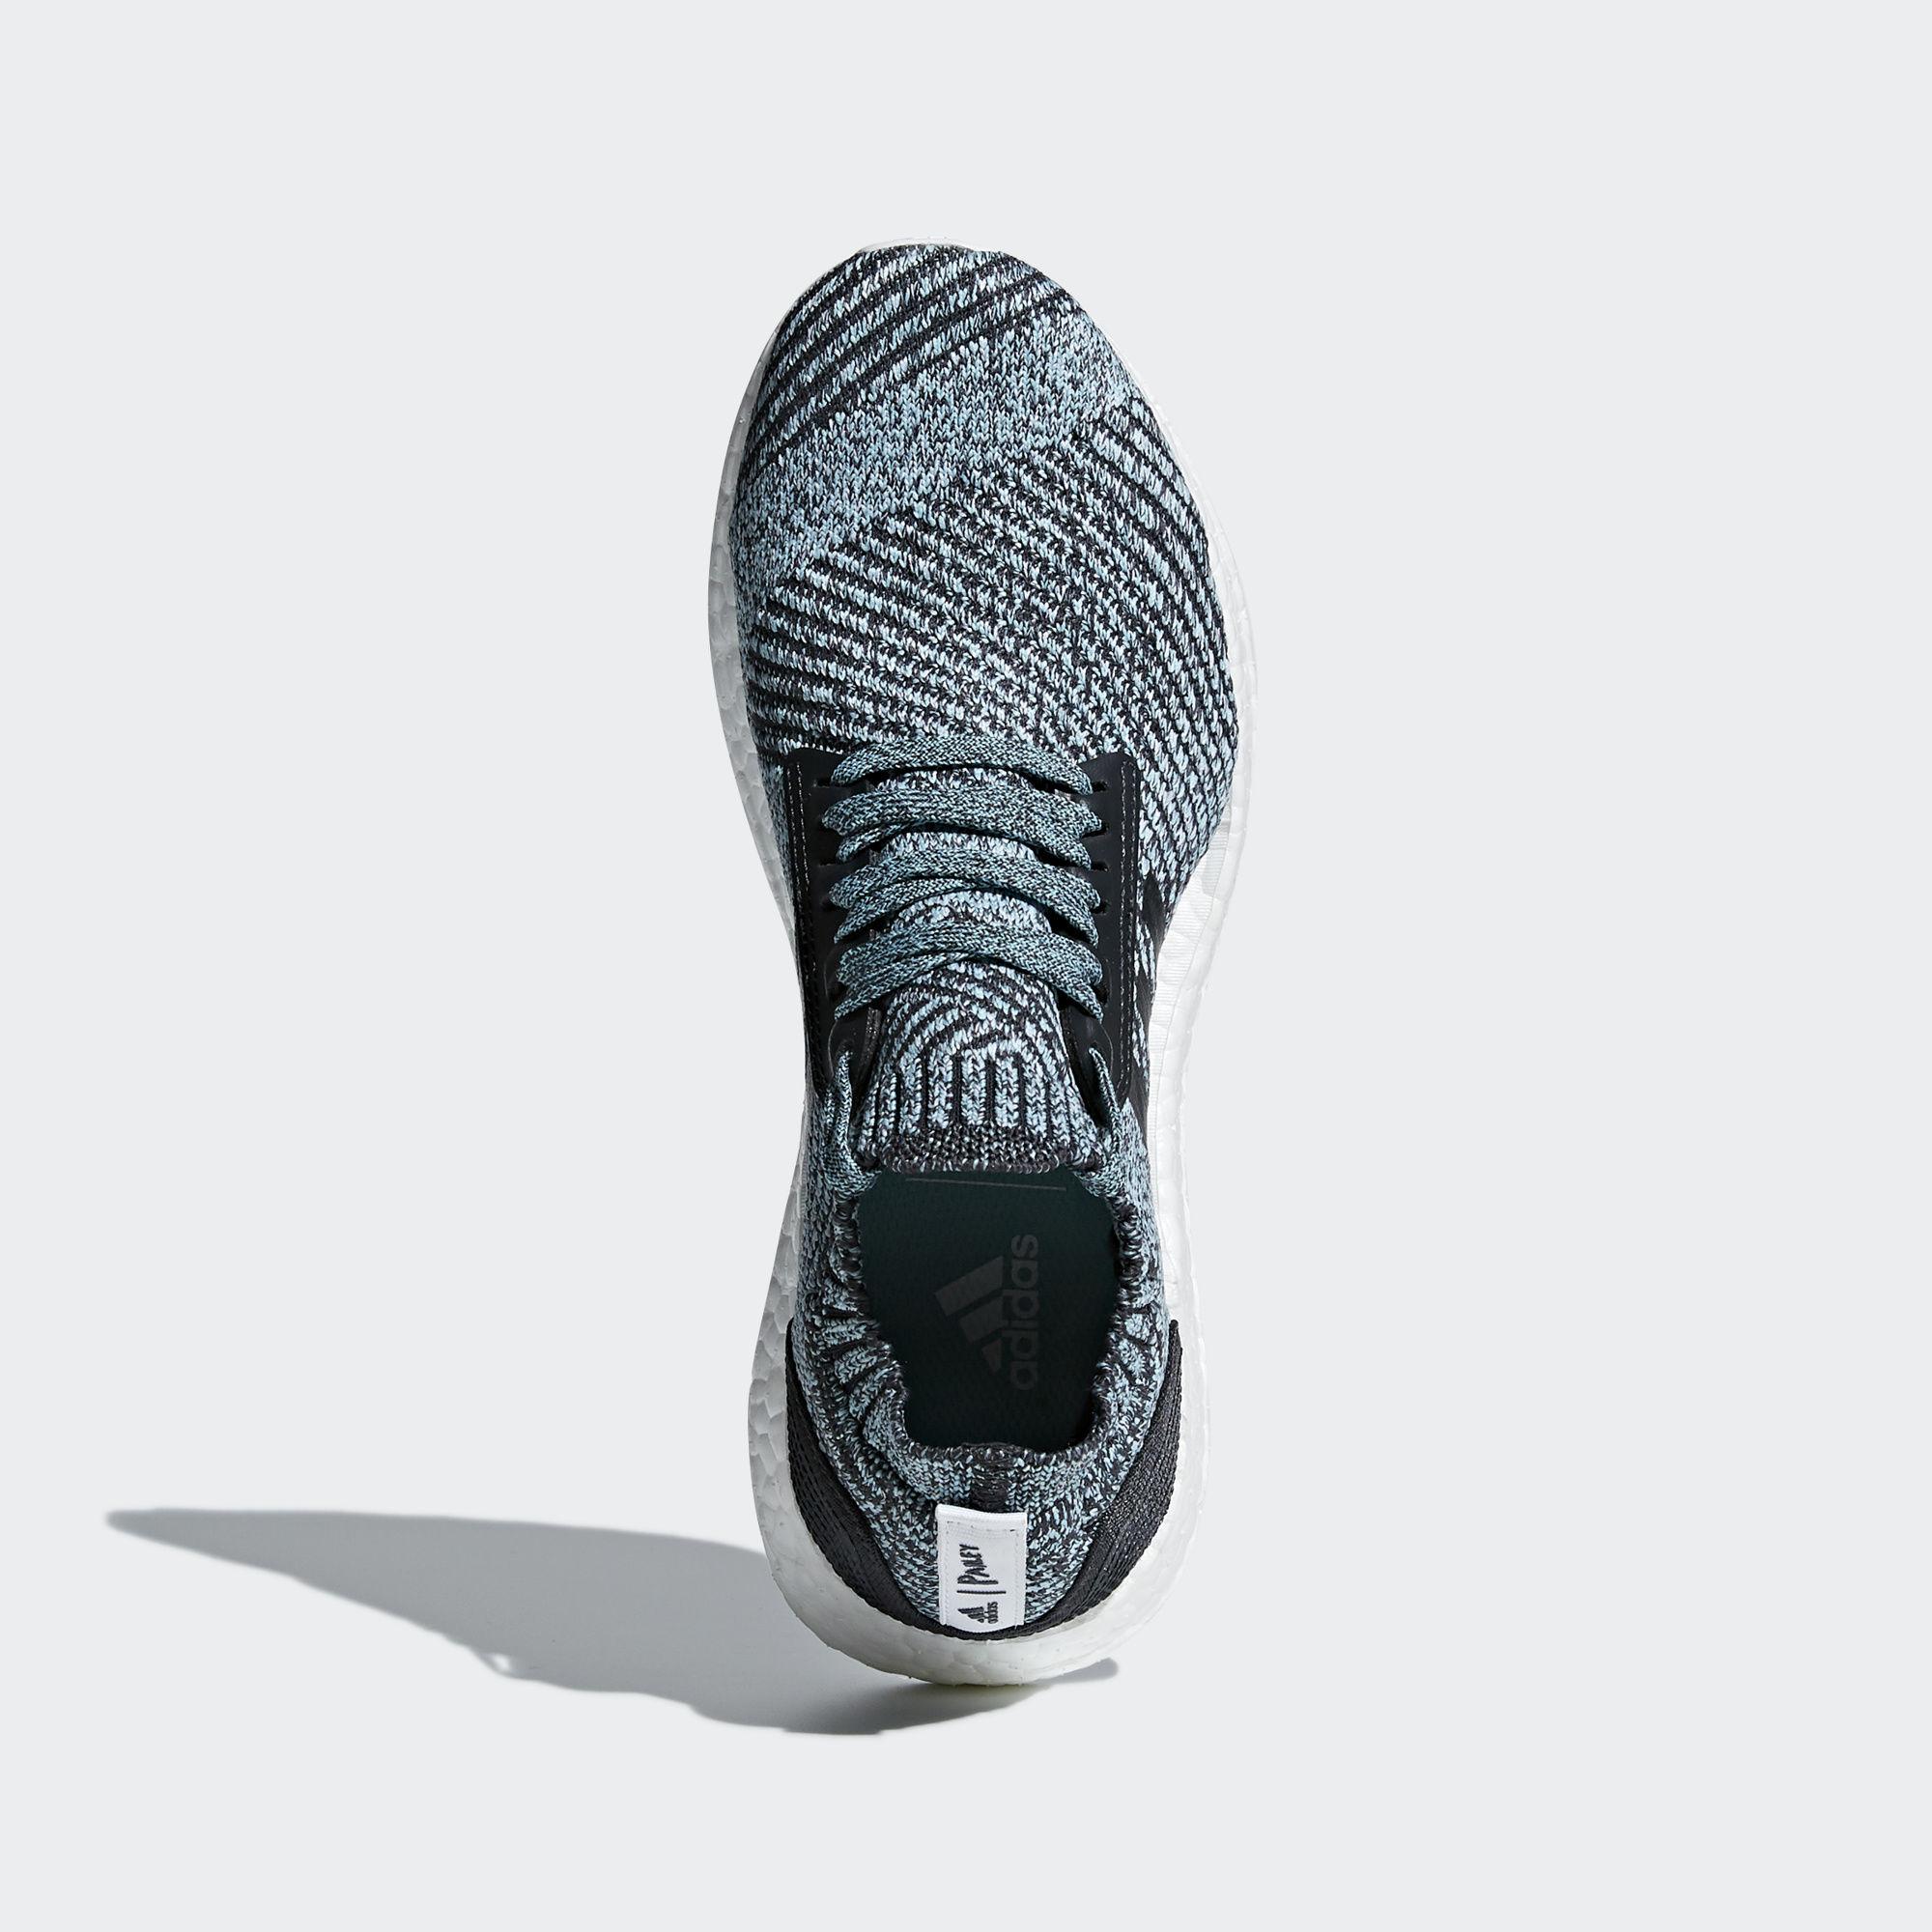 Adidas Ultraboost X Carbon/Carbon/Blue Spirit (DB0641)